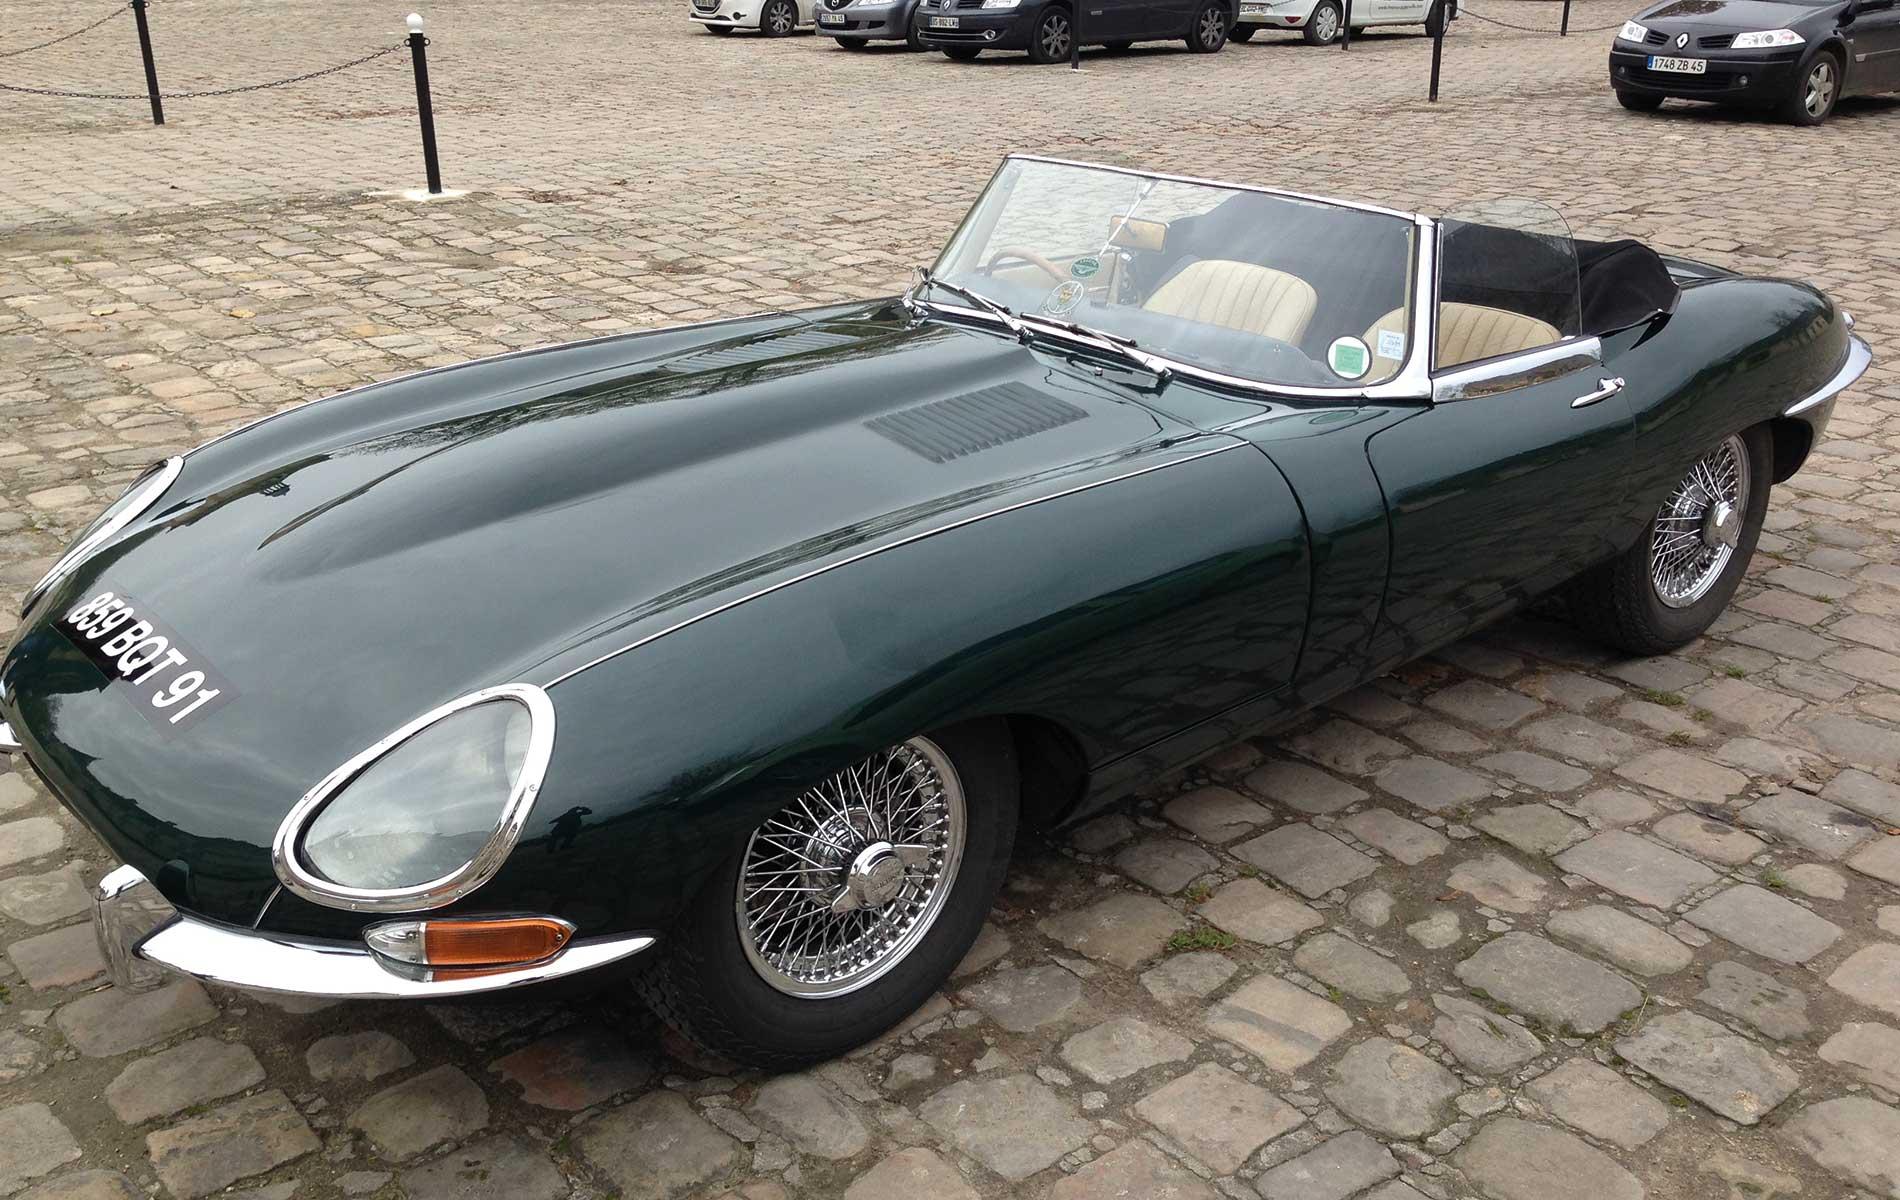 1965 Jaguar E-Type Series I - 4.2 Roadster